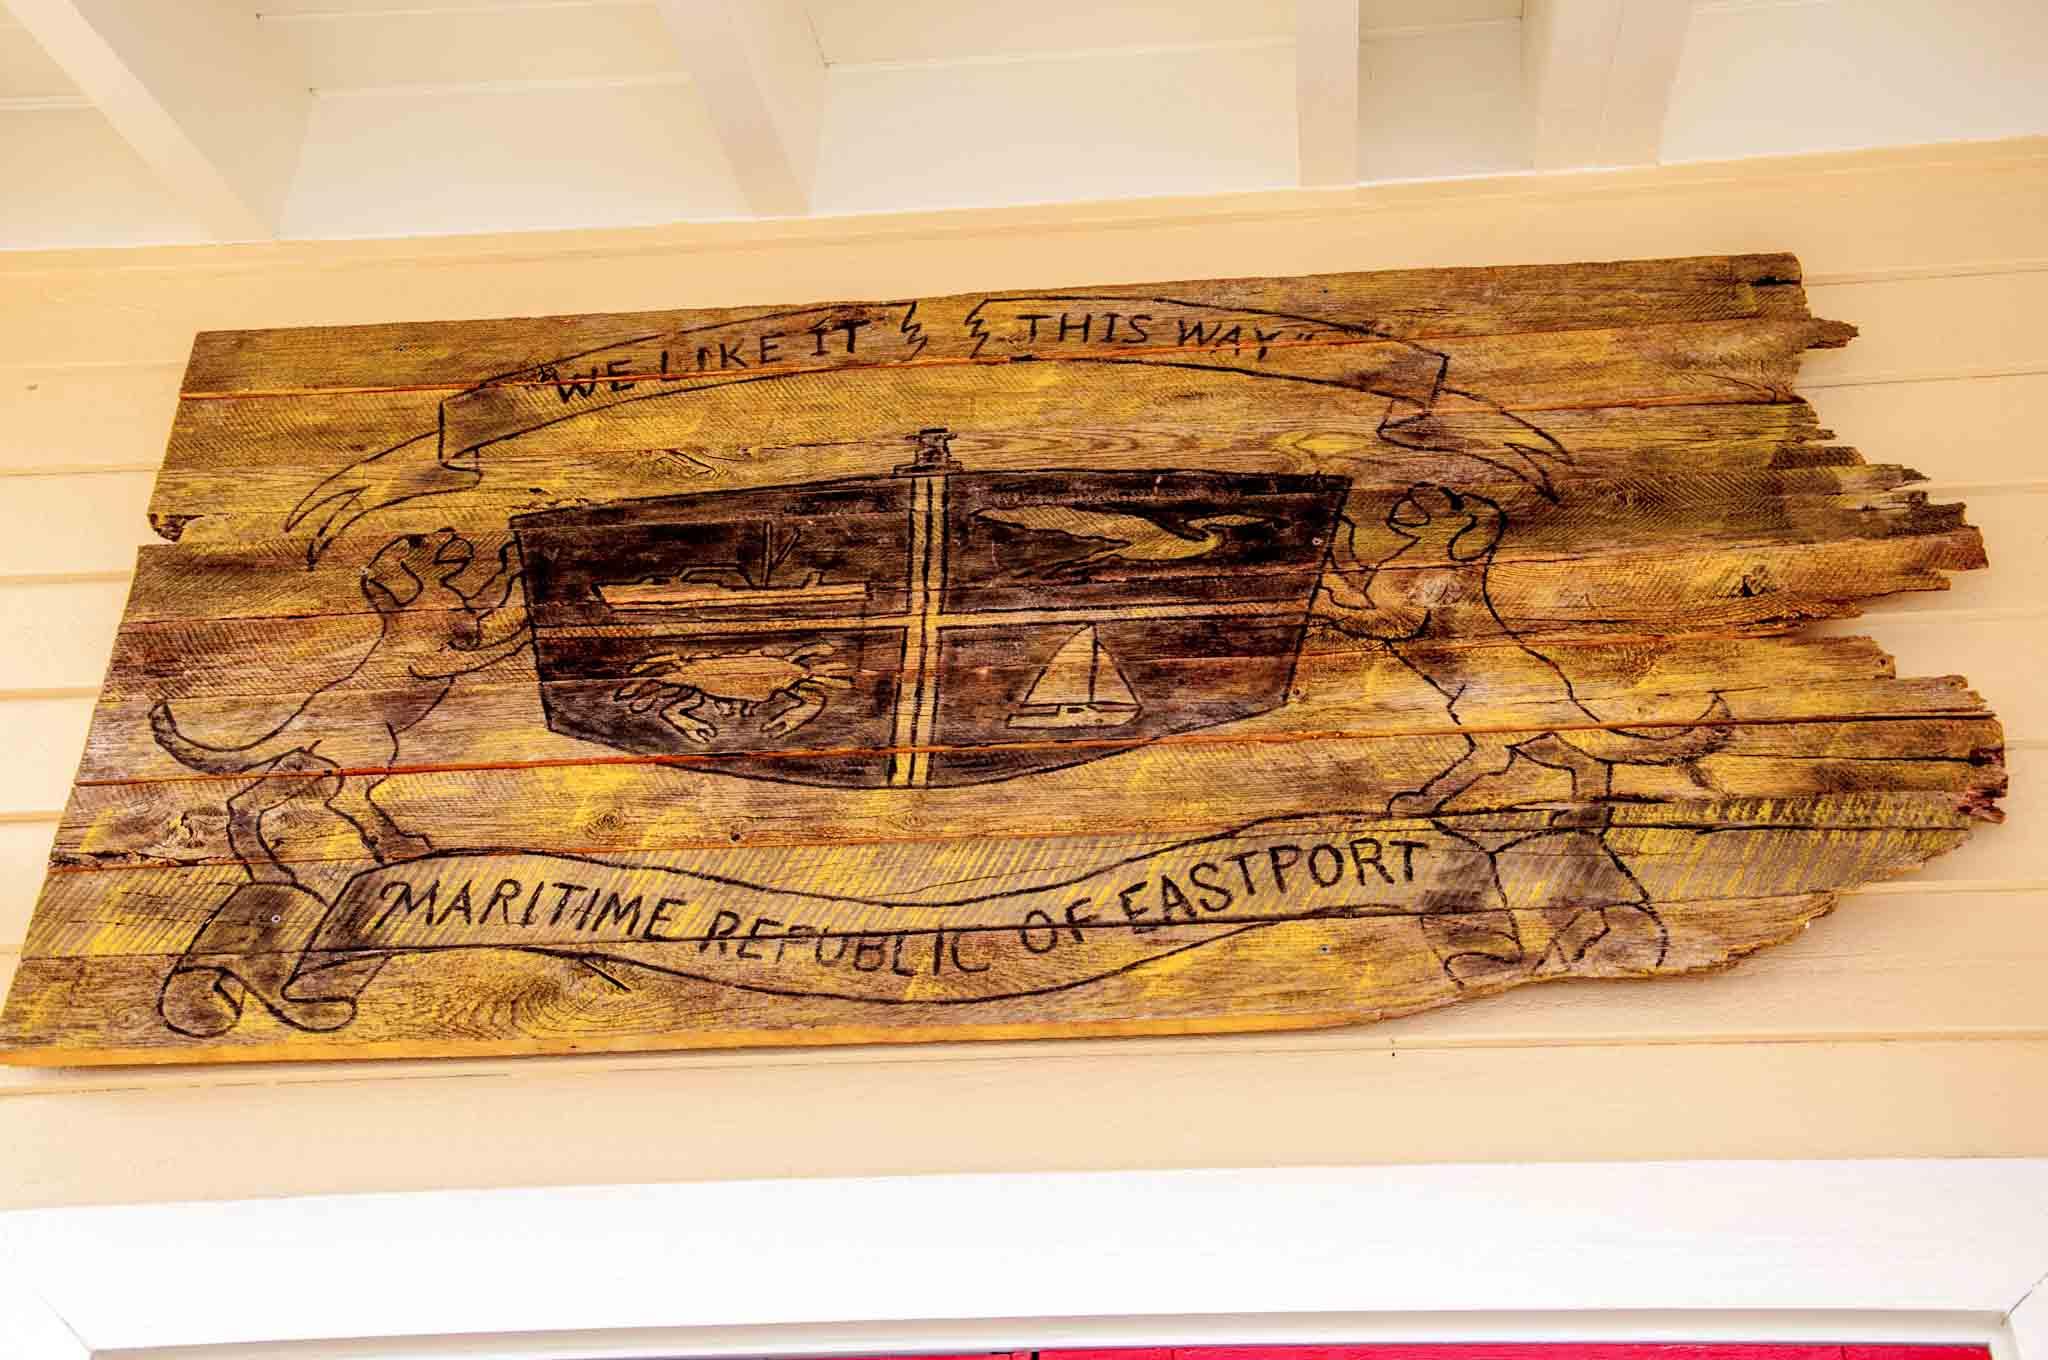 The Eastport flag: We like it this way, Maritime Republic of Eastport